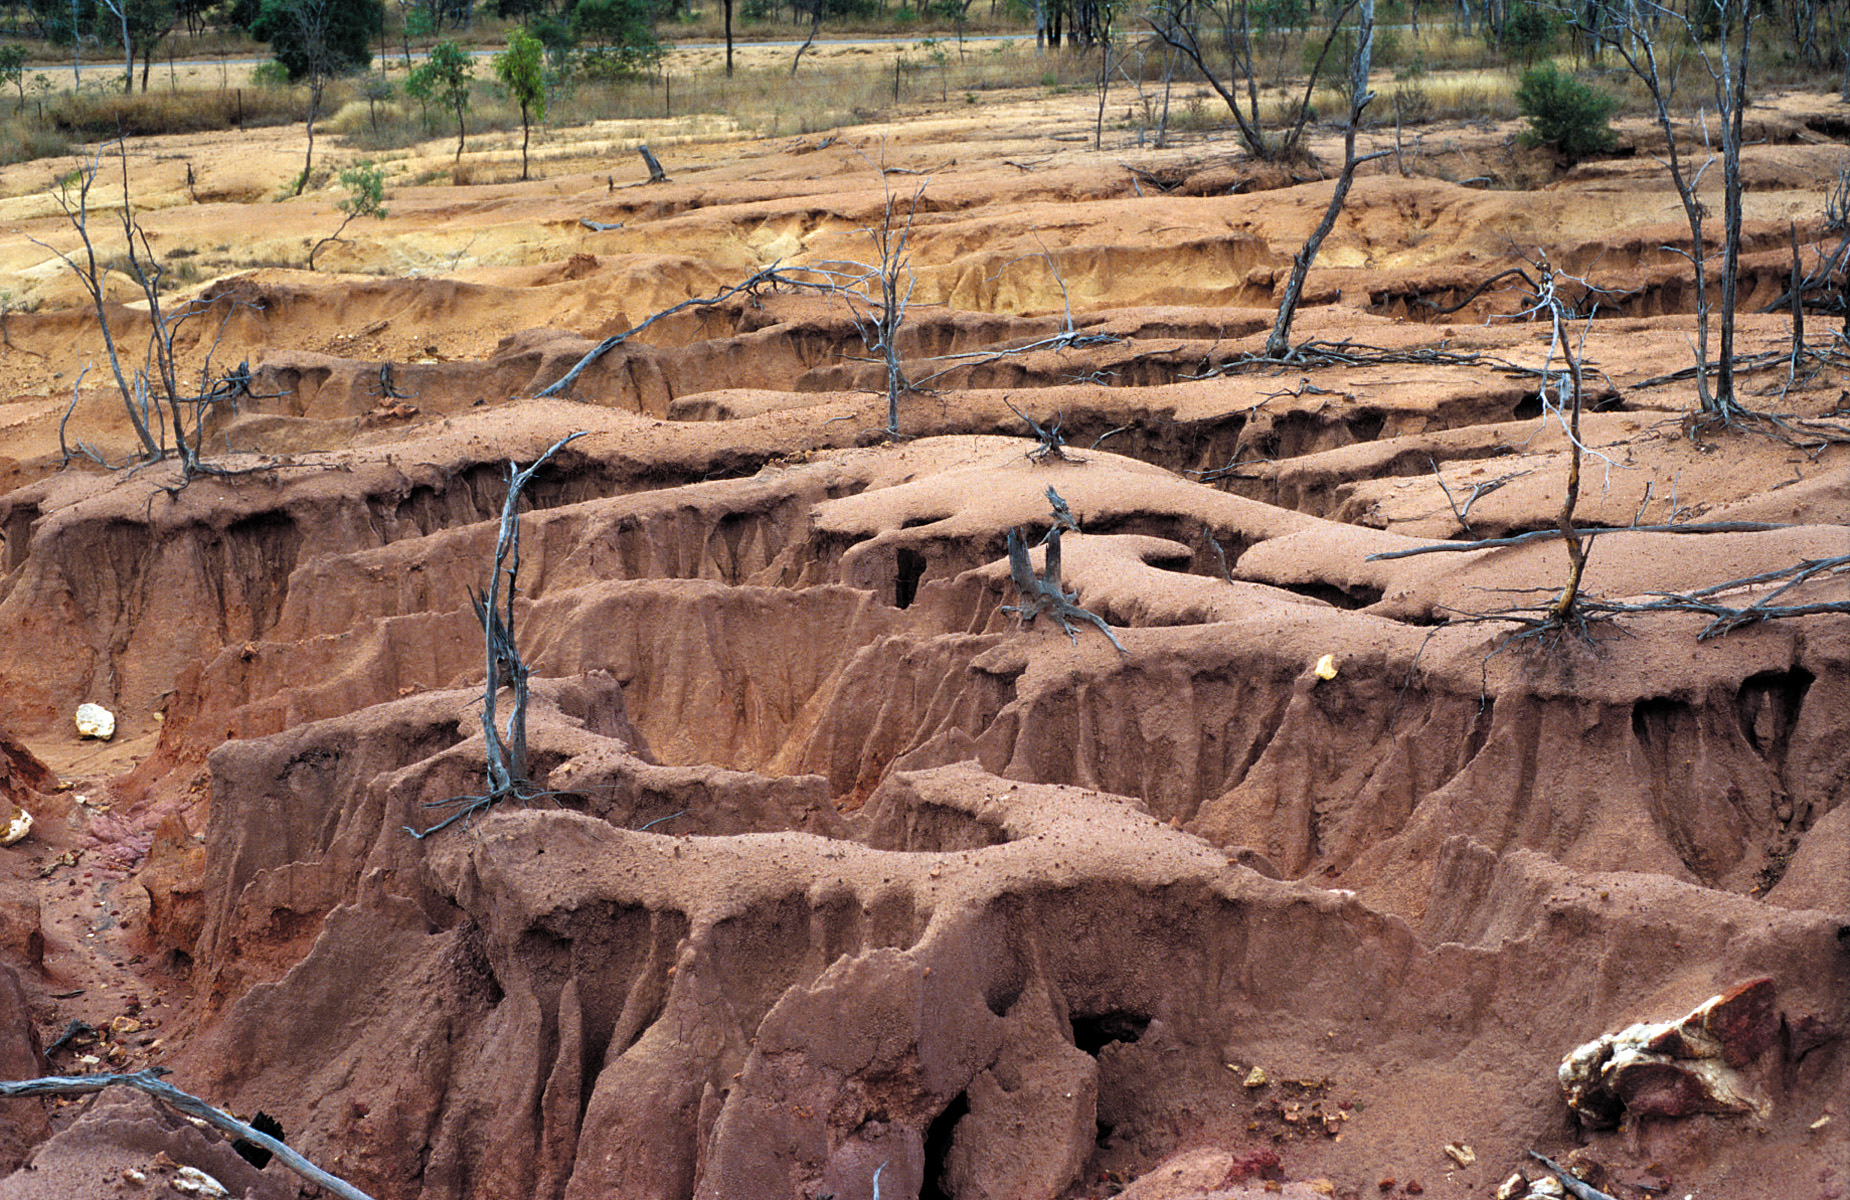 Image gallery sheet erosion for Soil erosion causes